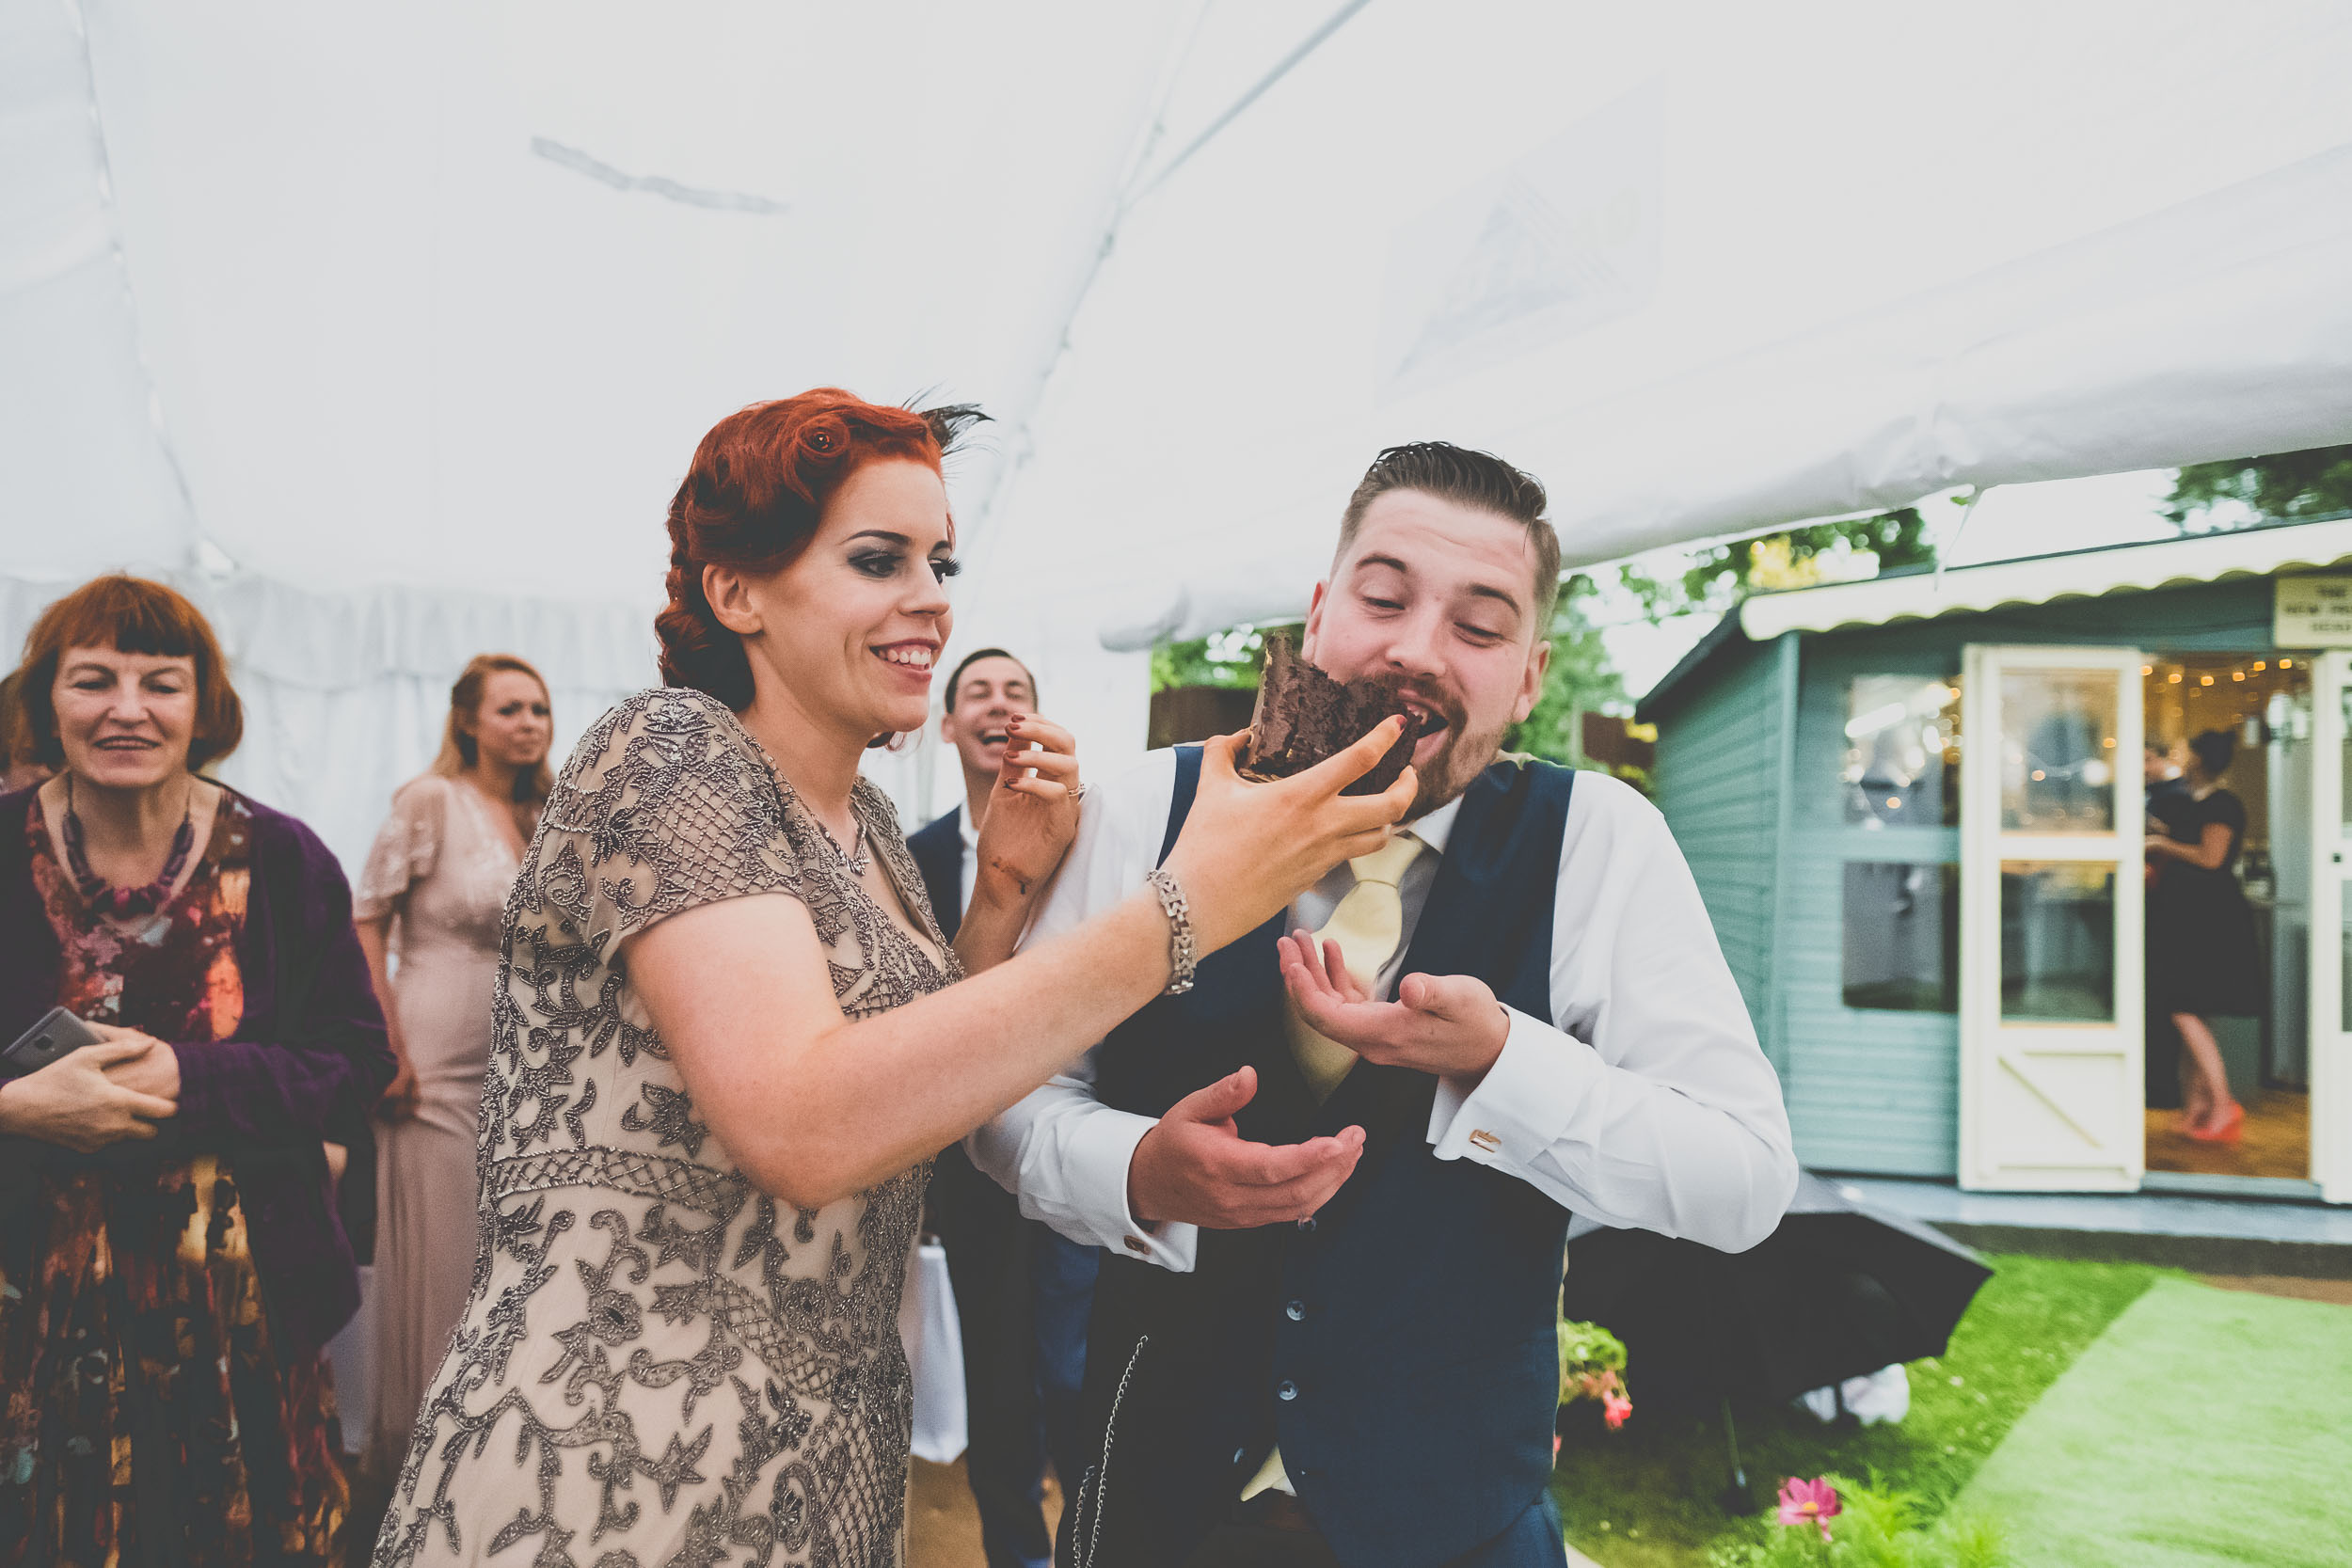 queen-elizabeths-hunting-lodge-epping-forest-wedding392.jpg